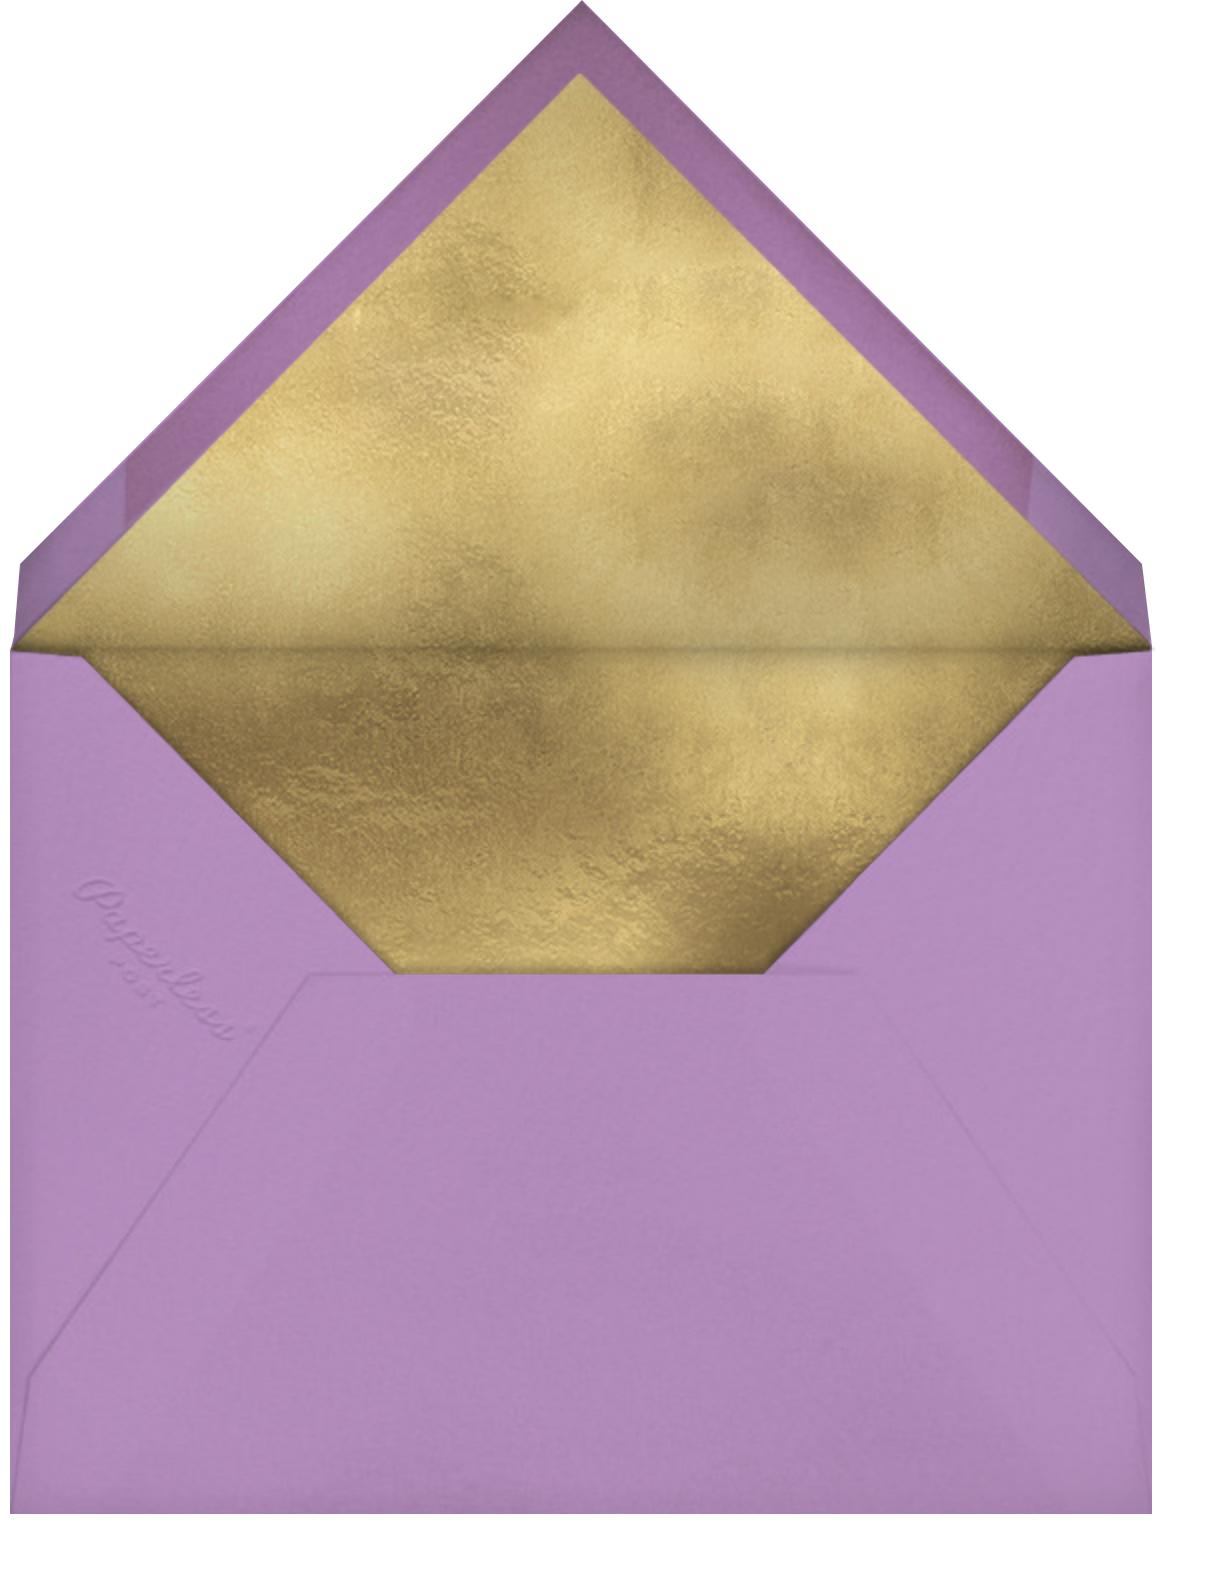 Marbleous - Wisteria - Ashley G - Adult birthday - envelope back